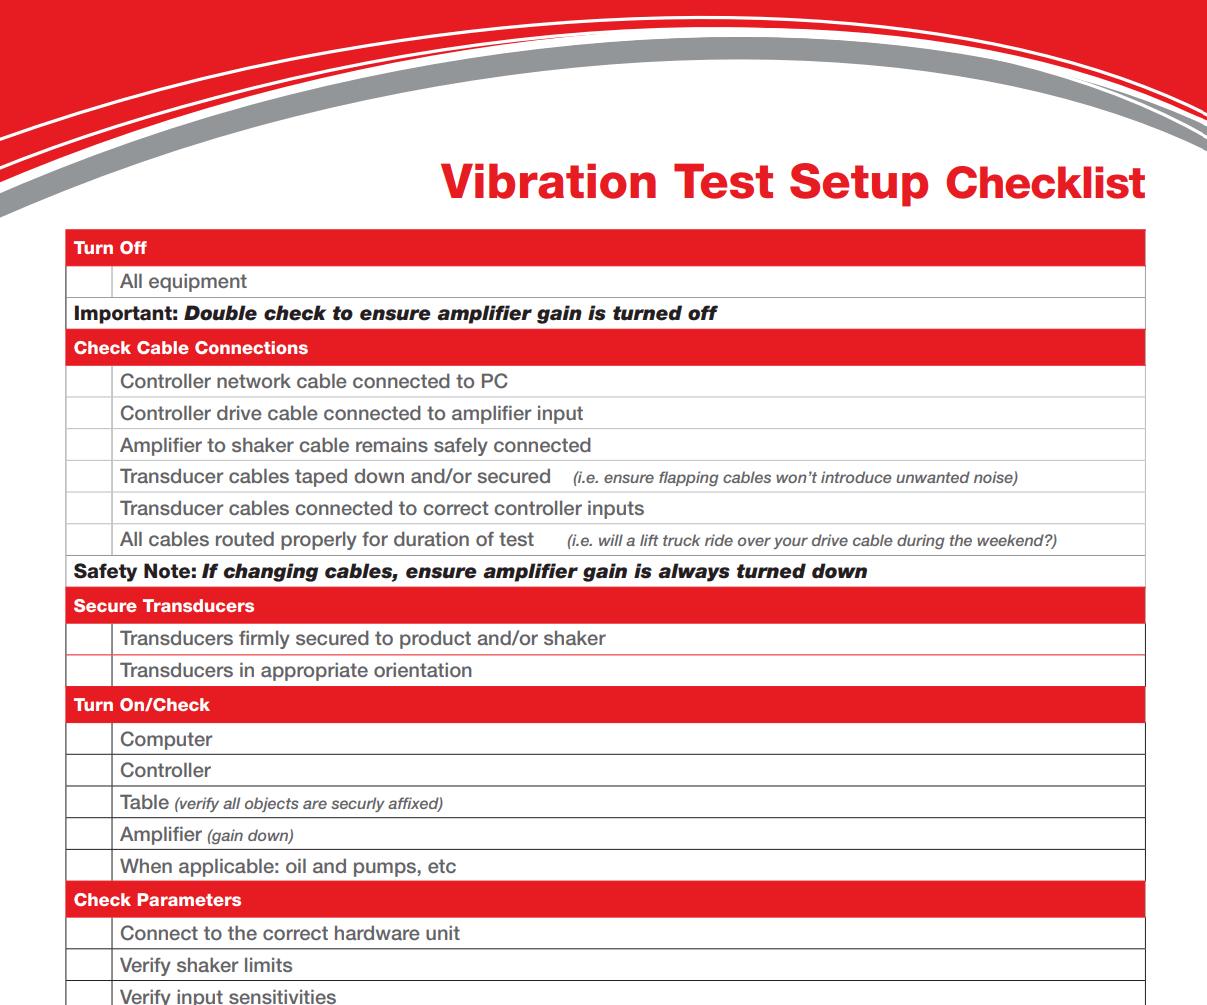 Vibration test setup checklist